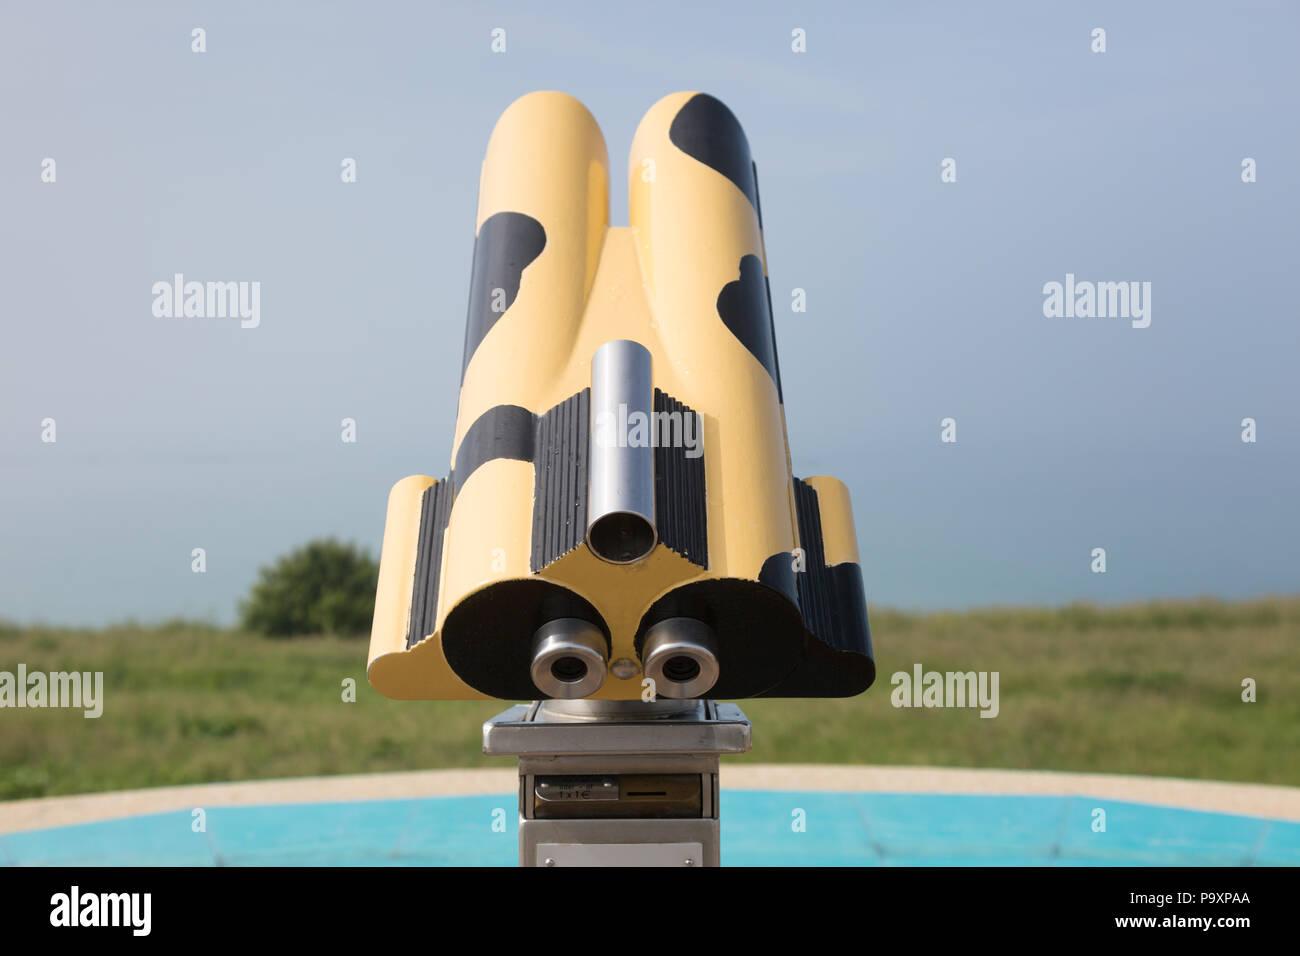 Pay binoculars near the beach, Normandy, France - Stock Image